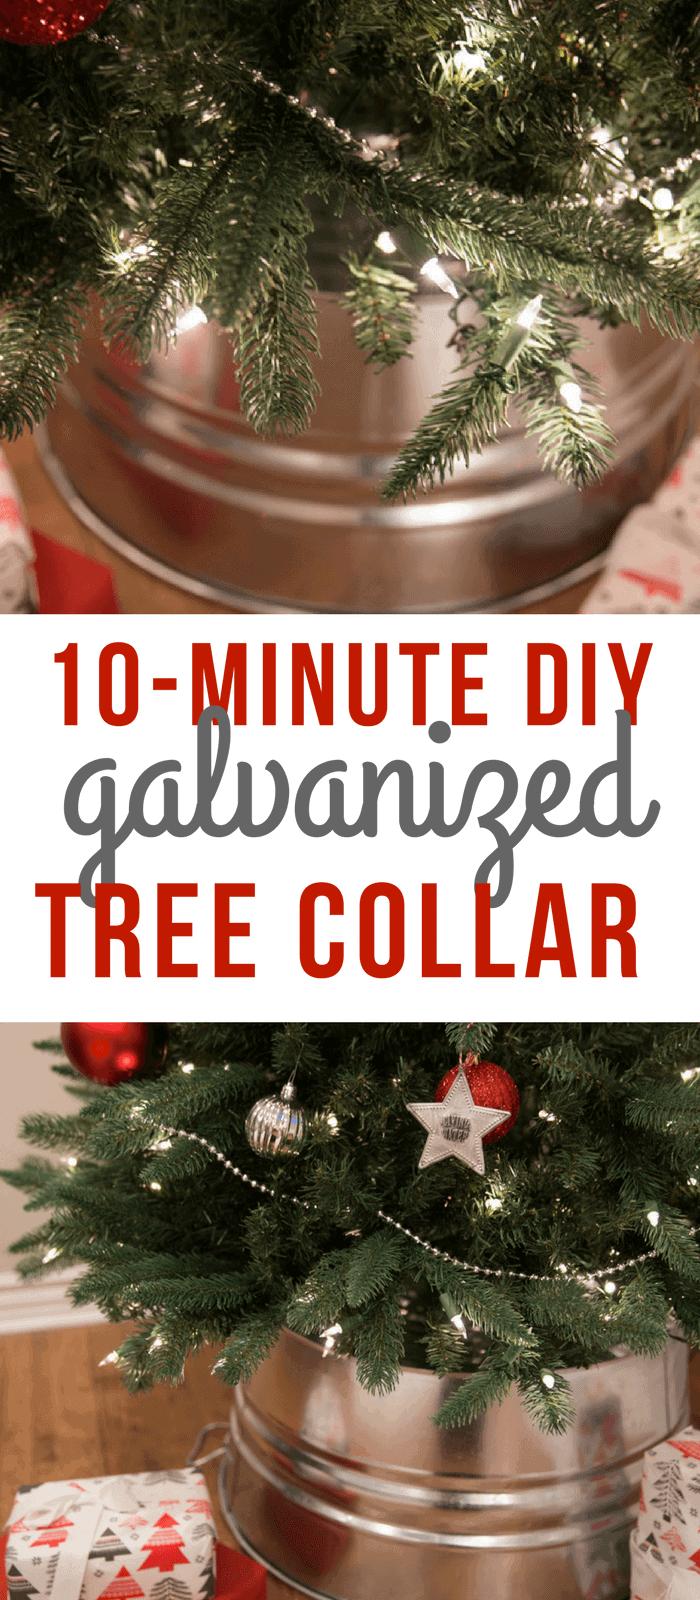 10 minute diy galvanized tree collar tutorial so festive. Black Bedroom Furniture Sets. Home Design Ideas